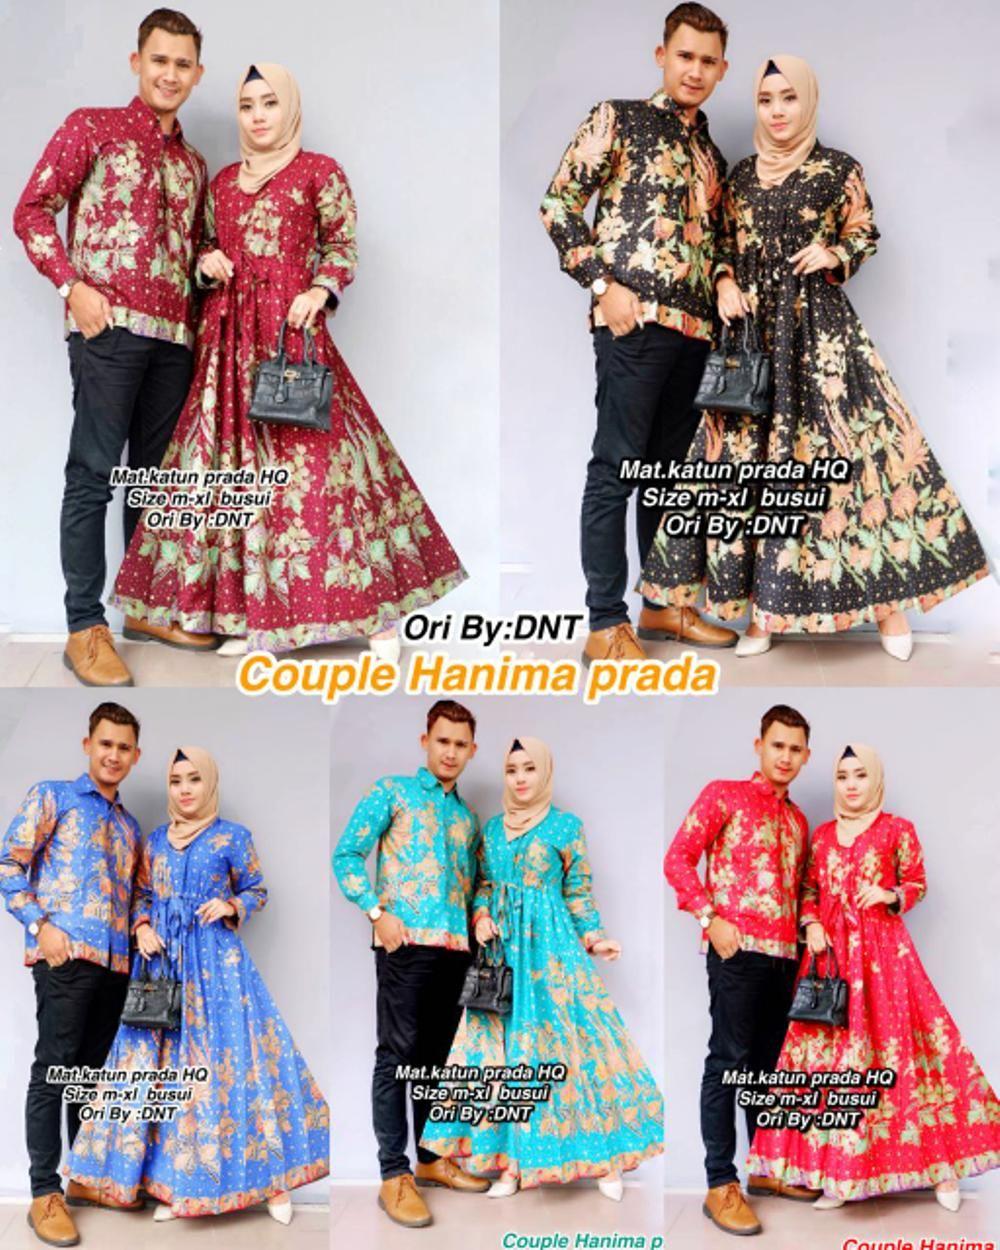 Setelan Model Baju Batik Couple Semi Sutra Hanima terbaru  Model